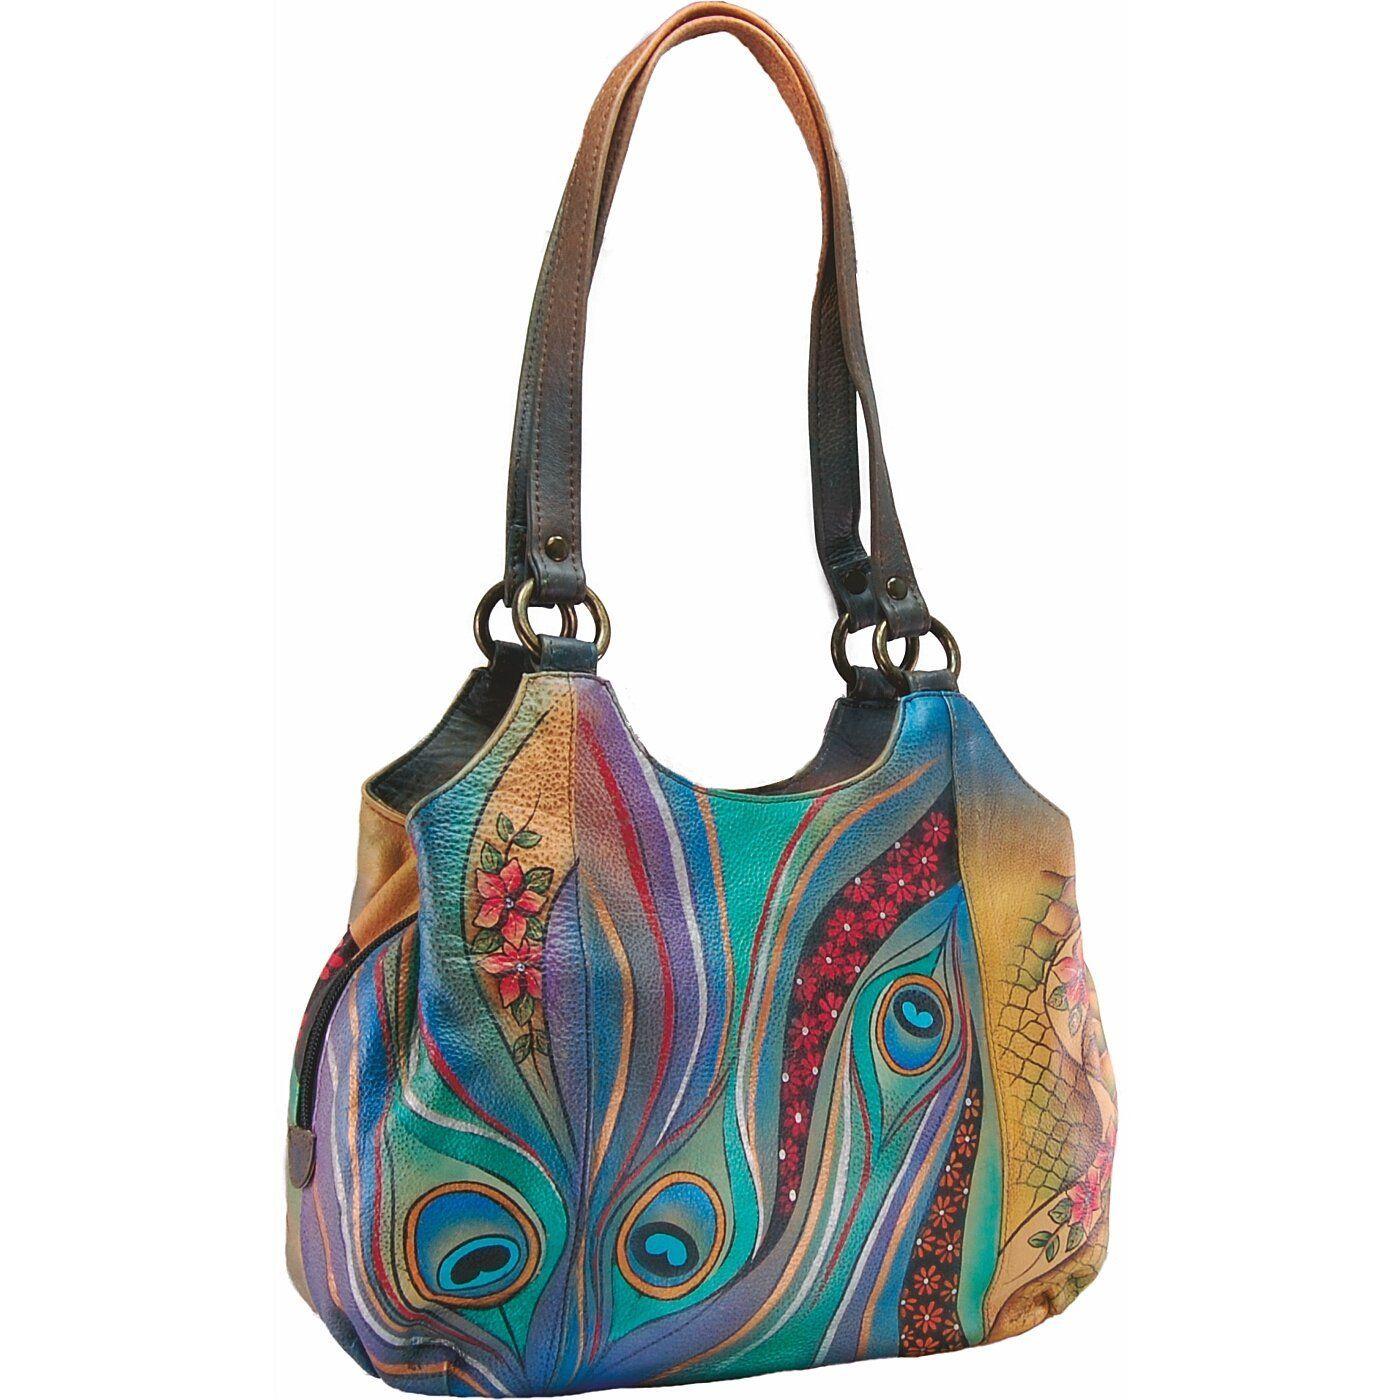 ANUSCHKA hand painted leather shoulder bag Amazon.co.uk